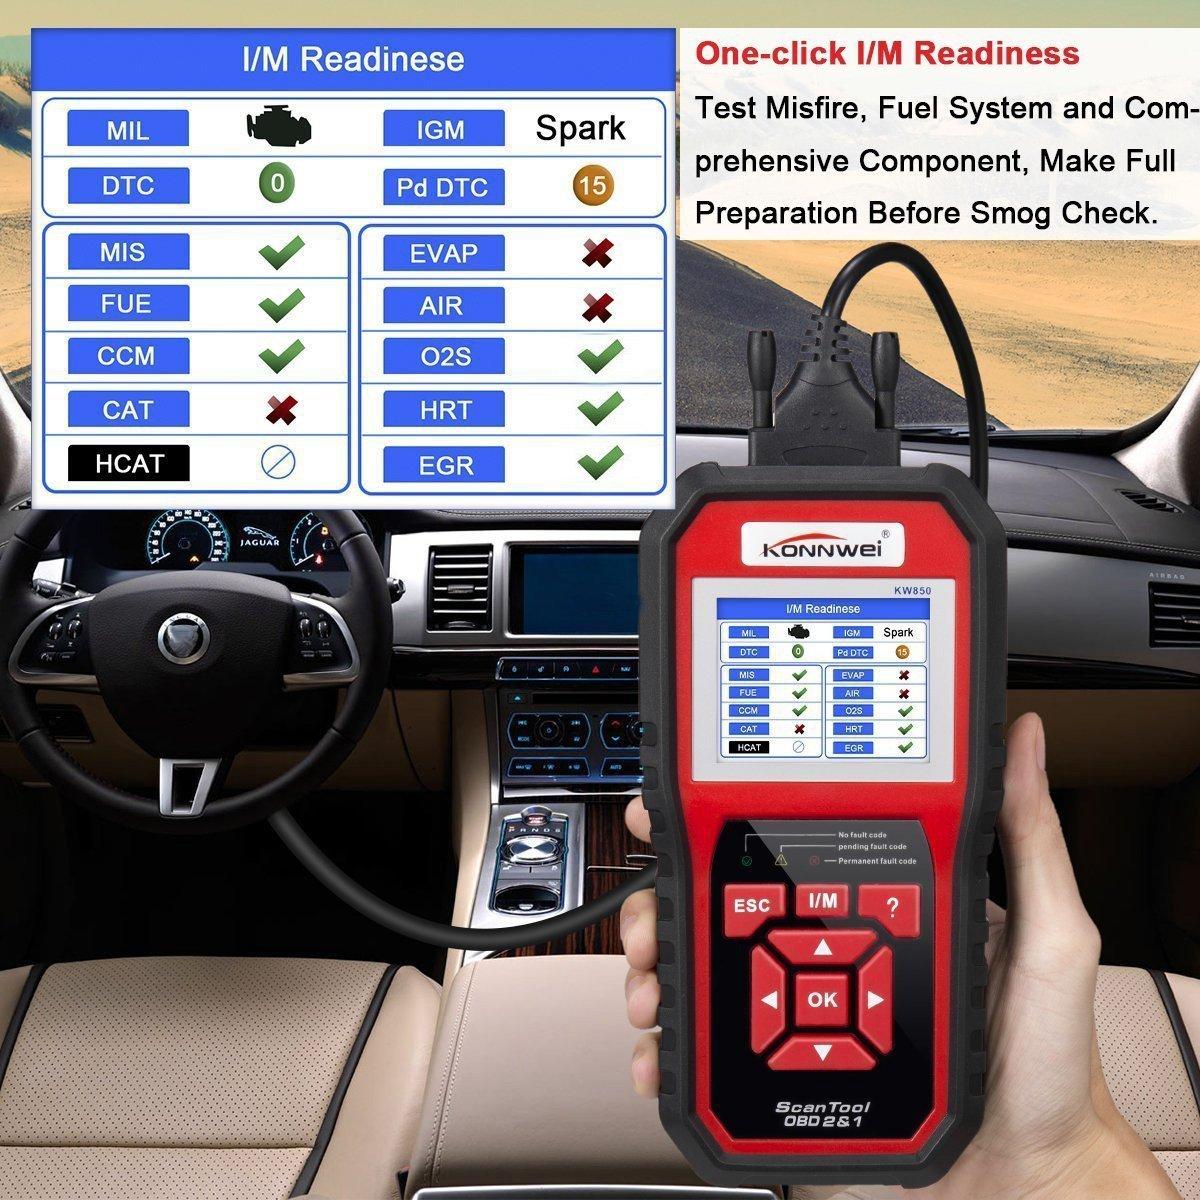 KONNWEI OBD2 Scanner OBDII Auto Diagnostic Code Scanner Universal Vehicle Engine O2 Sensor Systems Scanner OBD2 EOBD Scanners Tool Check Engine Light Code Reader for all OBD II Protocol Car Since 1996 by KONNWEI (Image #6)